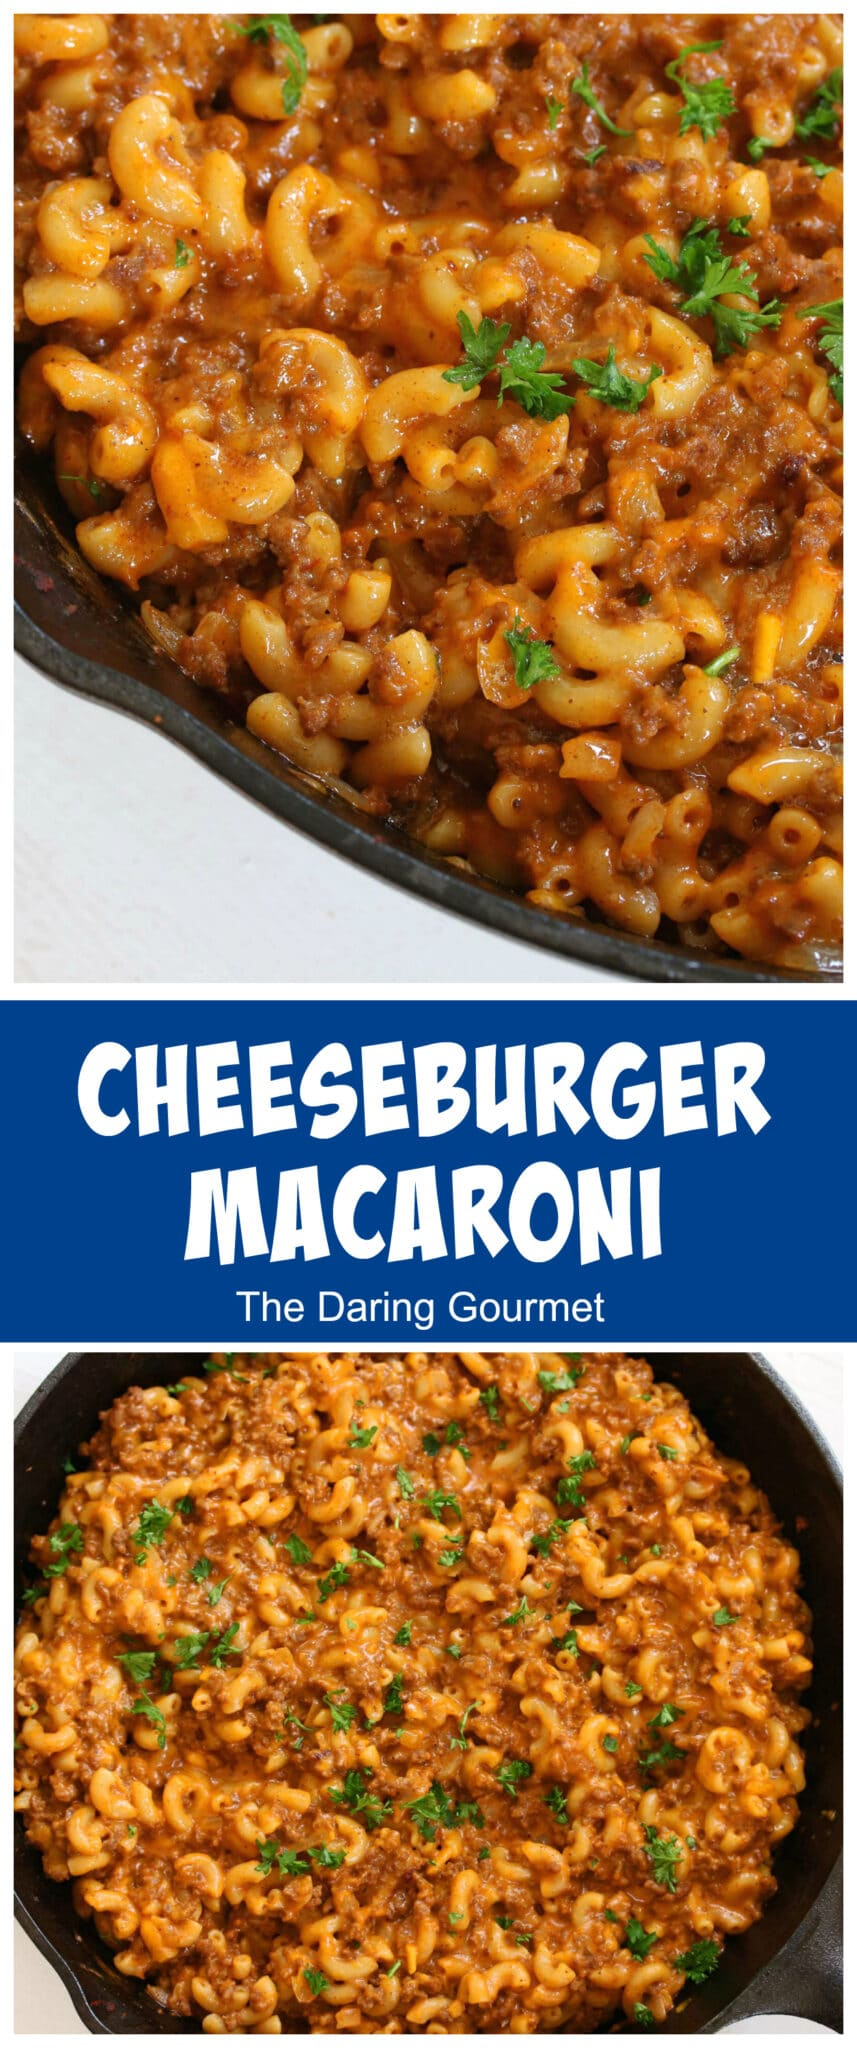 cheeseburger macaroni recipe homemade from scratch hamburger helper copycat healthy